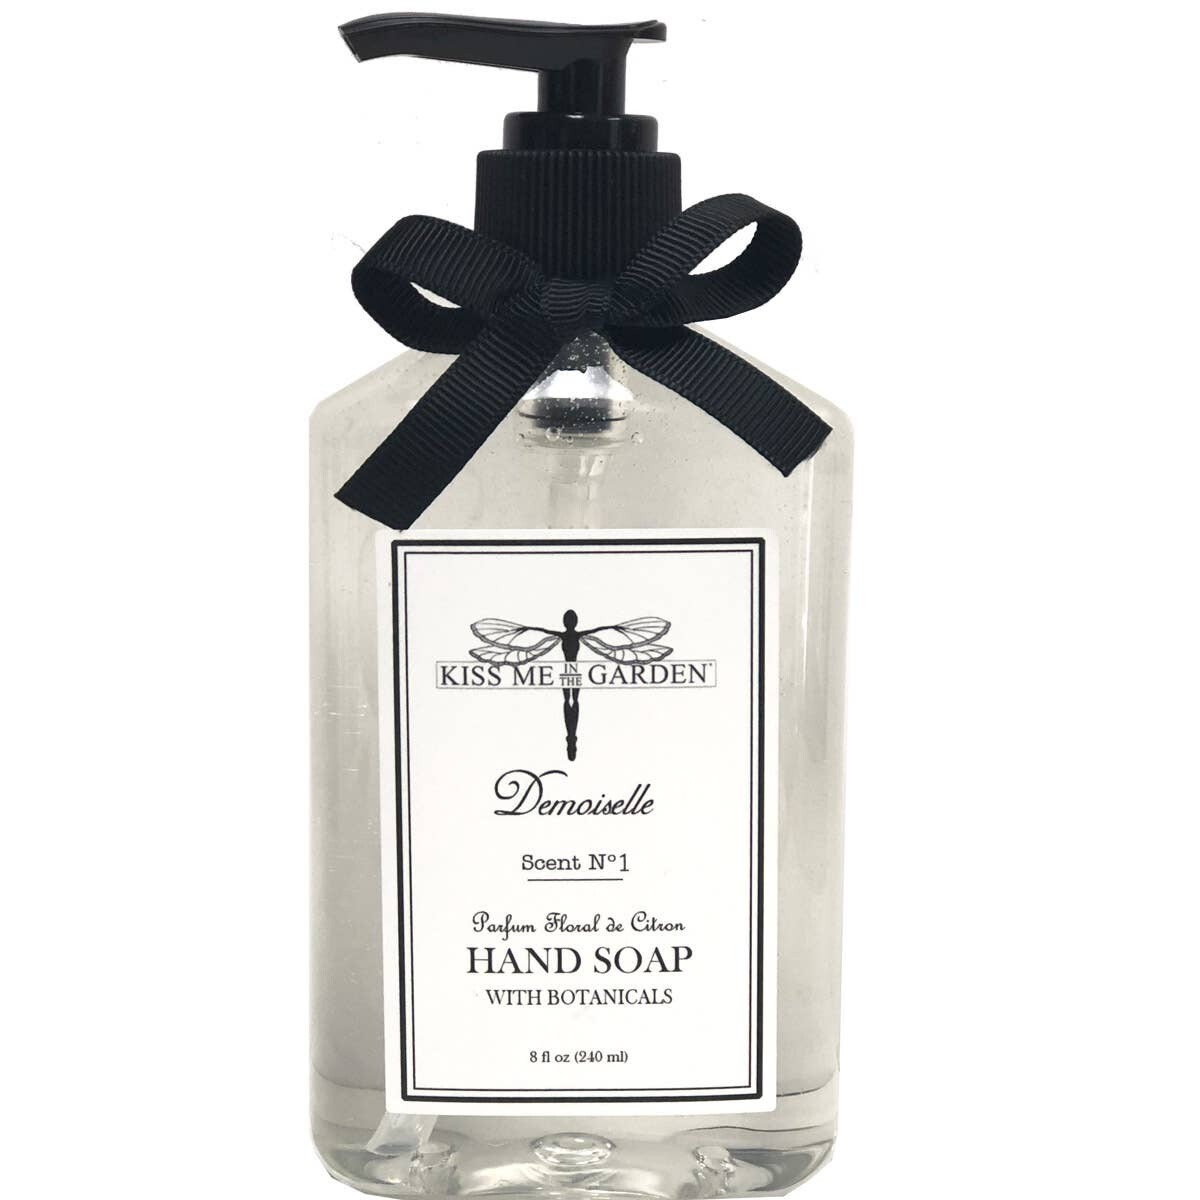 8 oz Demoiselle Liquid Hand Soap